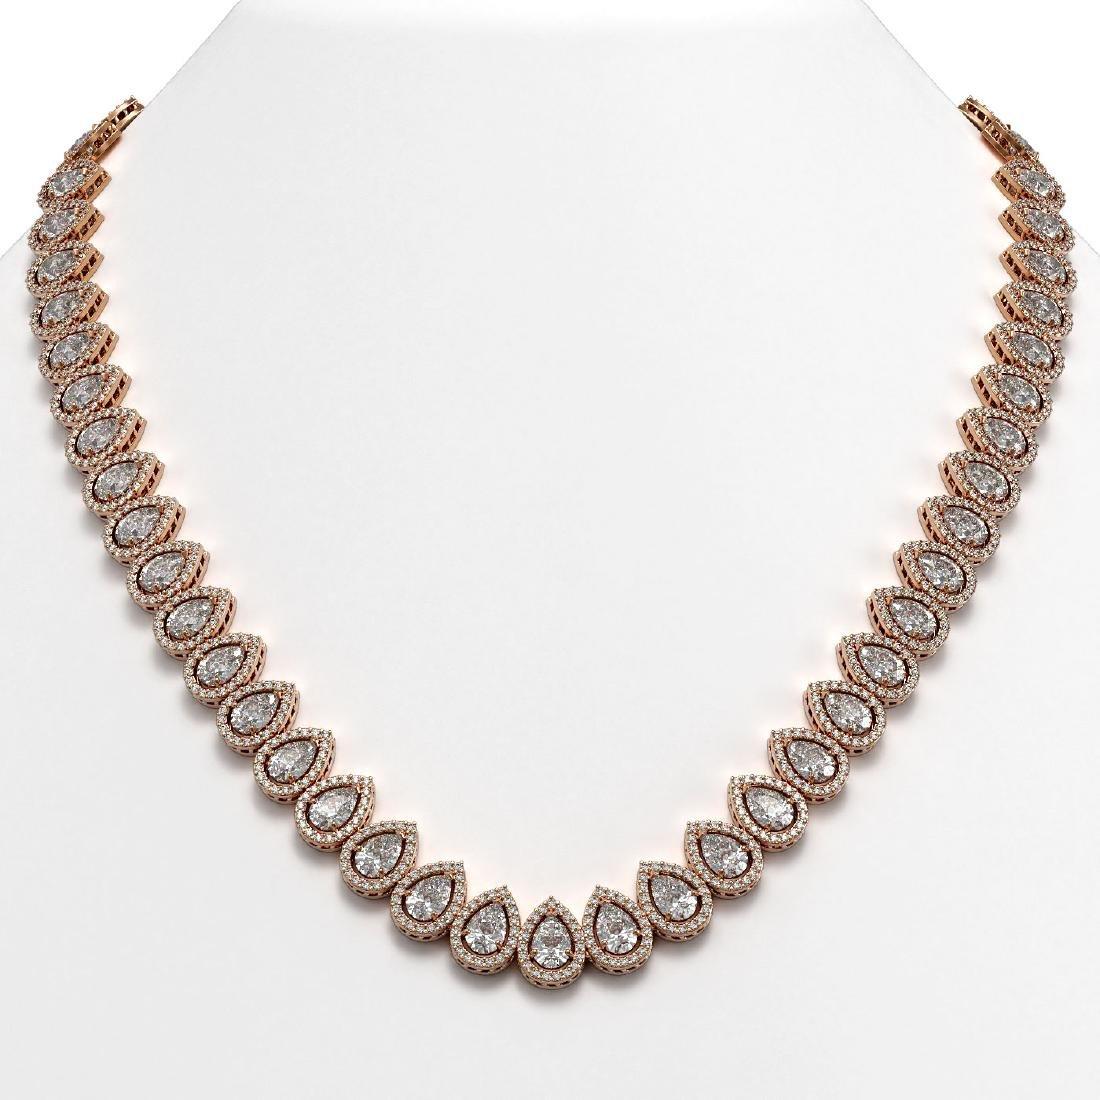 42.11 CTW Pear Diamond Designer Necklace 18K Rose Gold